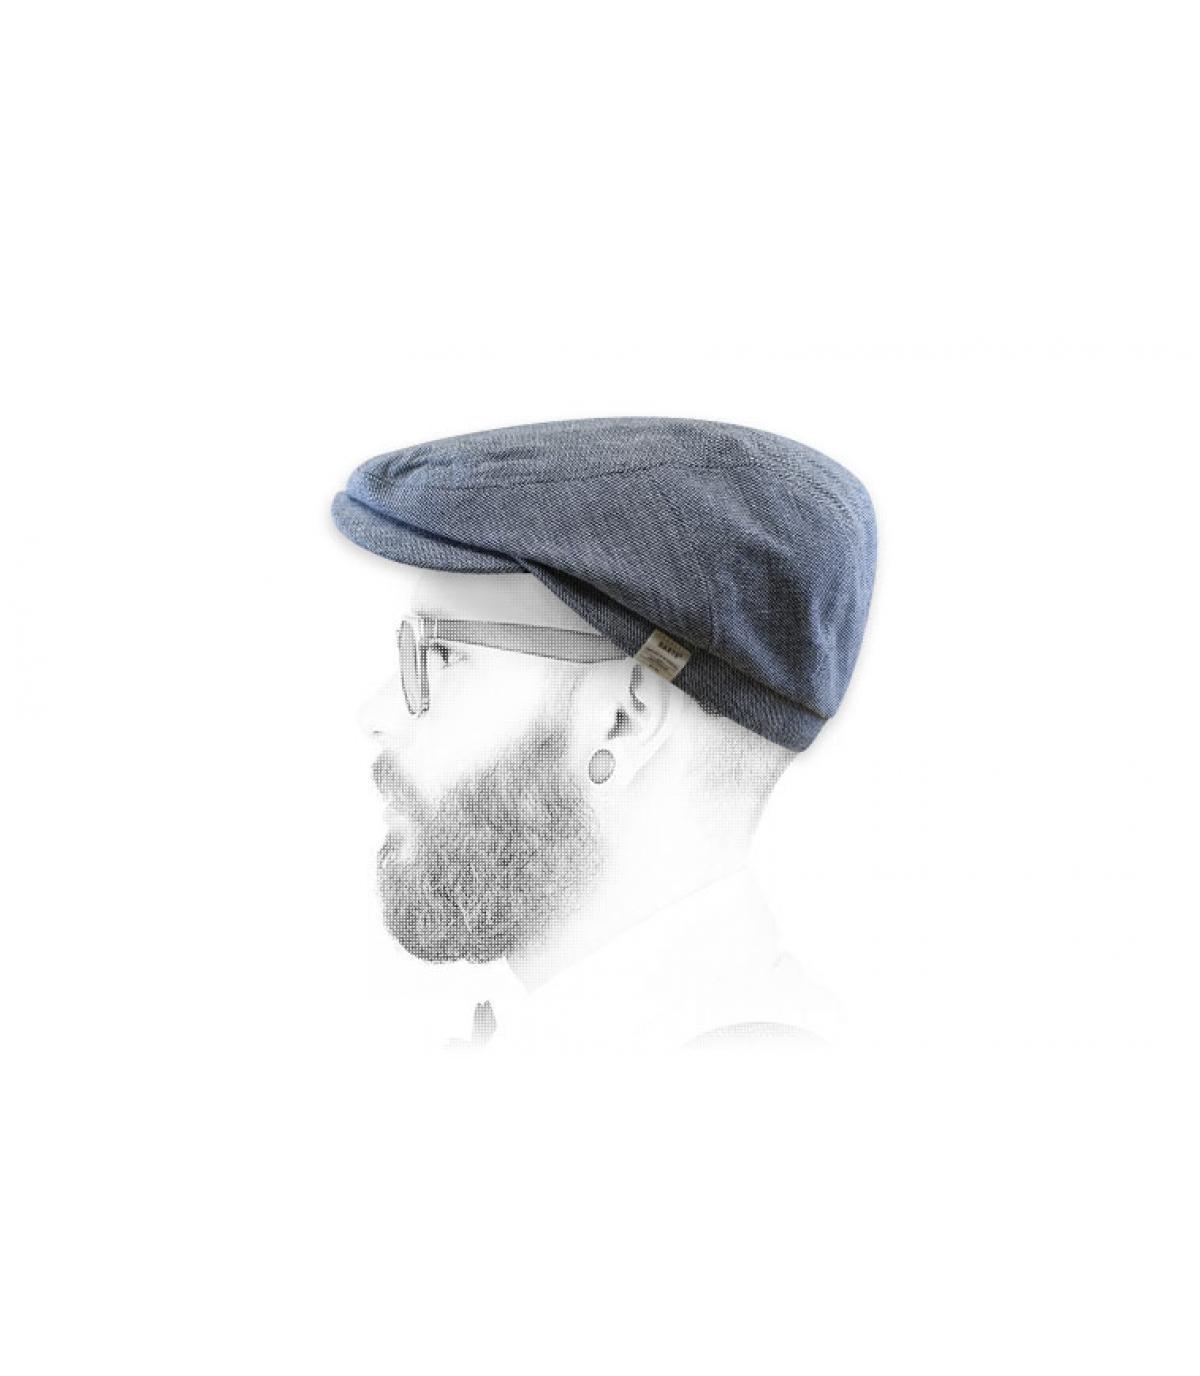 Flatcap blau Baumwolle Leinen